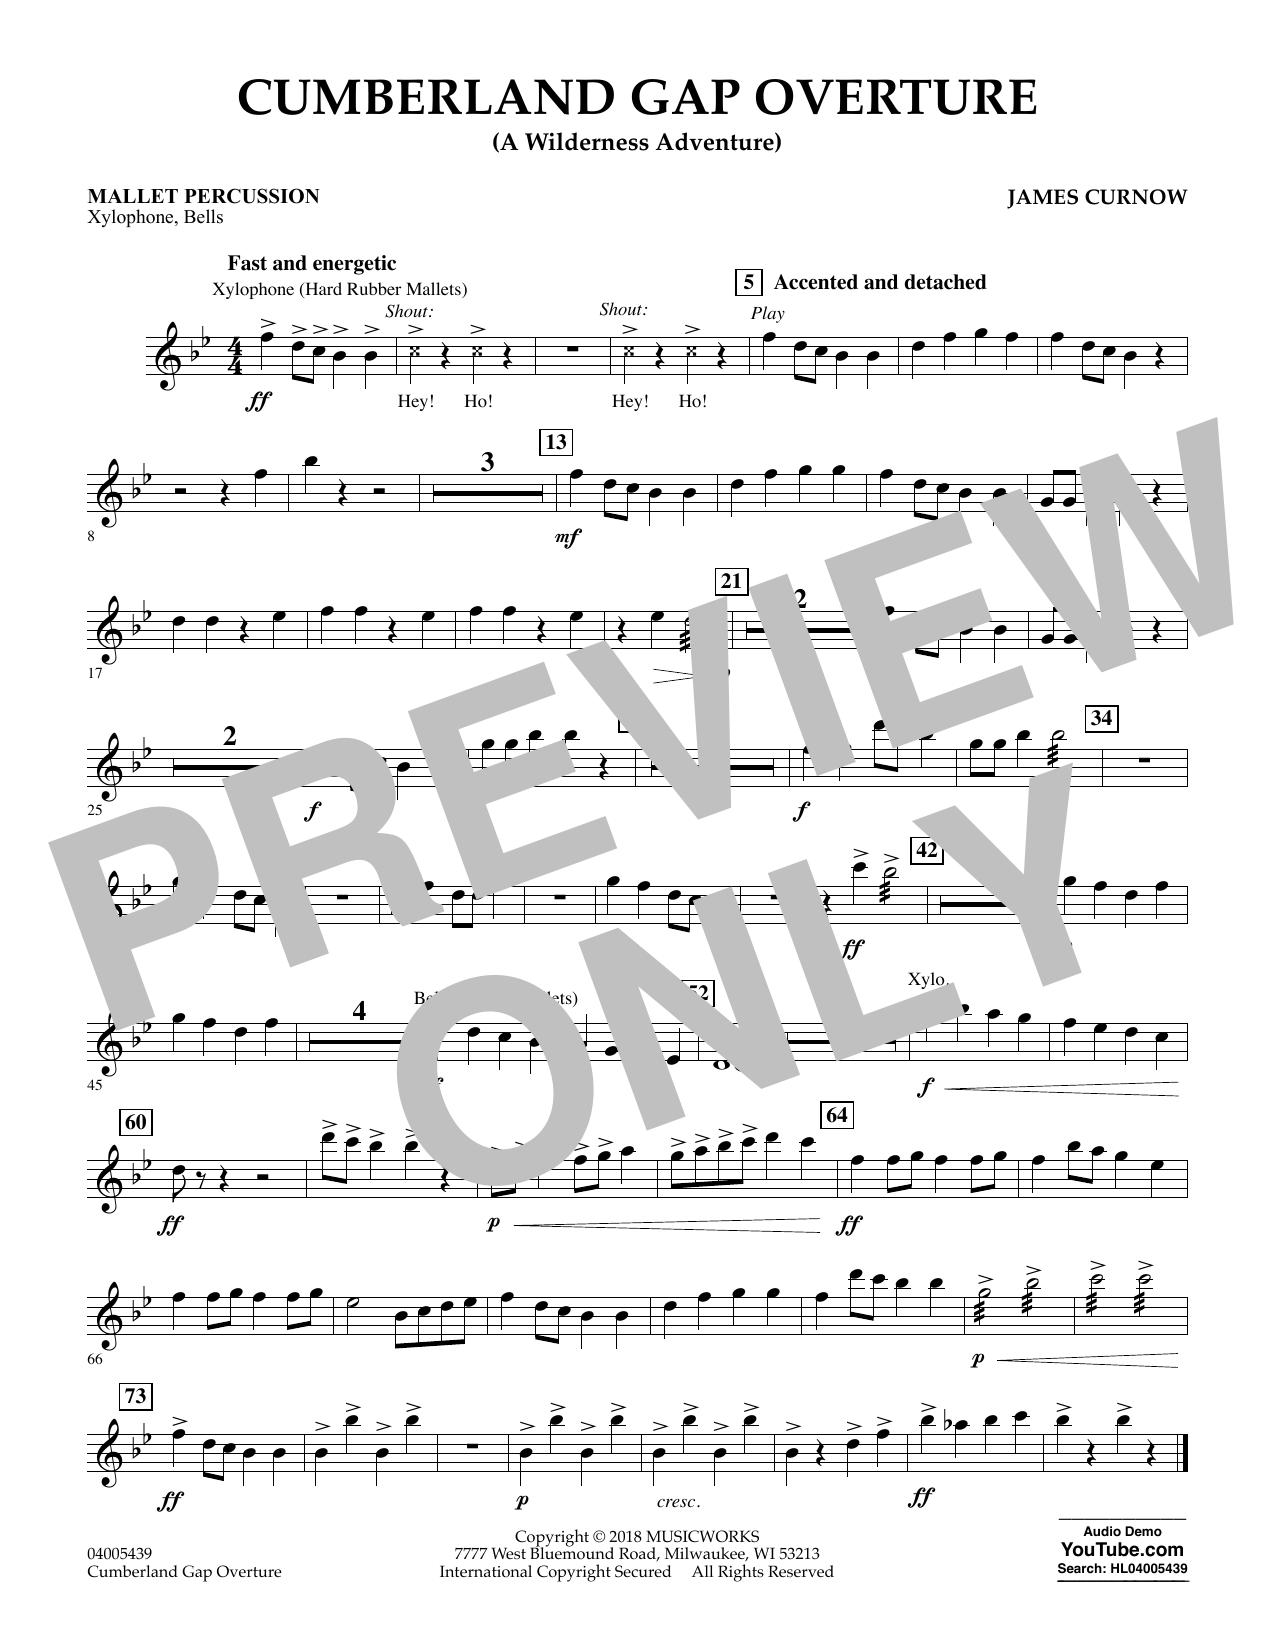 Cumberland Gap Overture (A Wilderness Adventure) - Mallet Percussion (Concert Band)